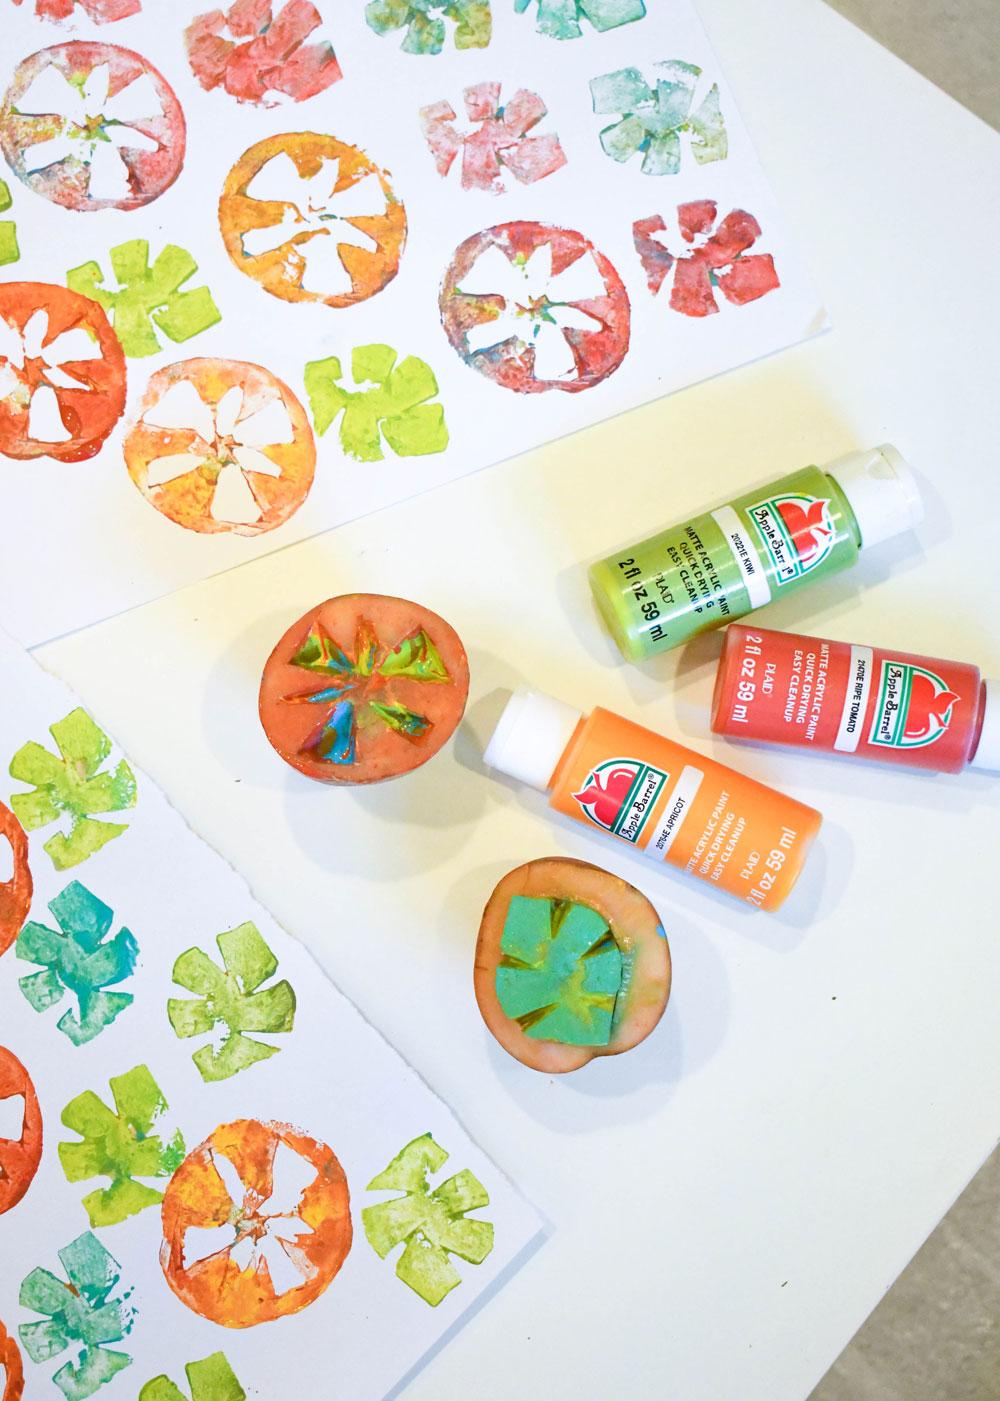 Make custom art with DIY potato stamps